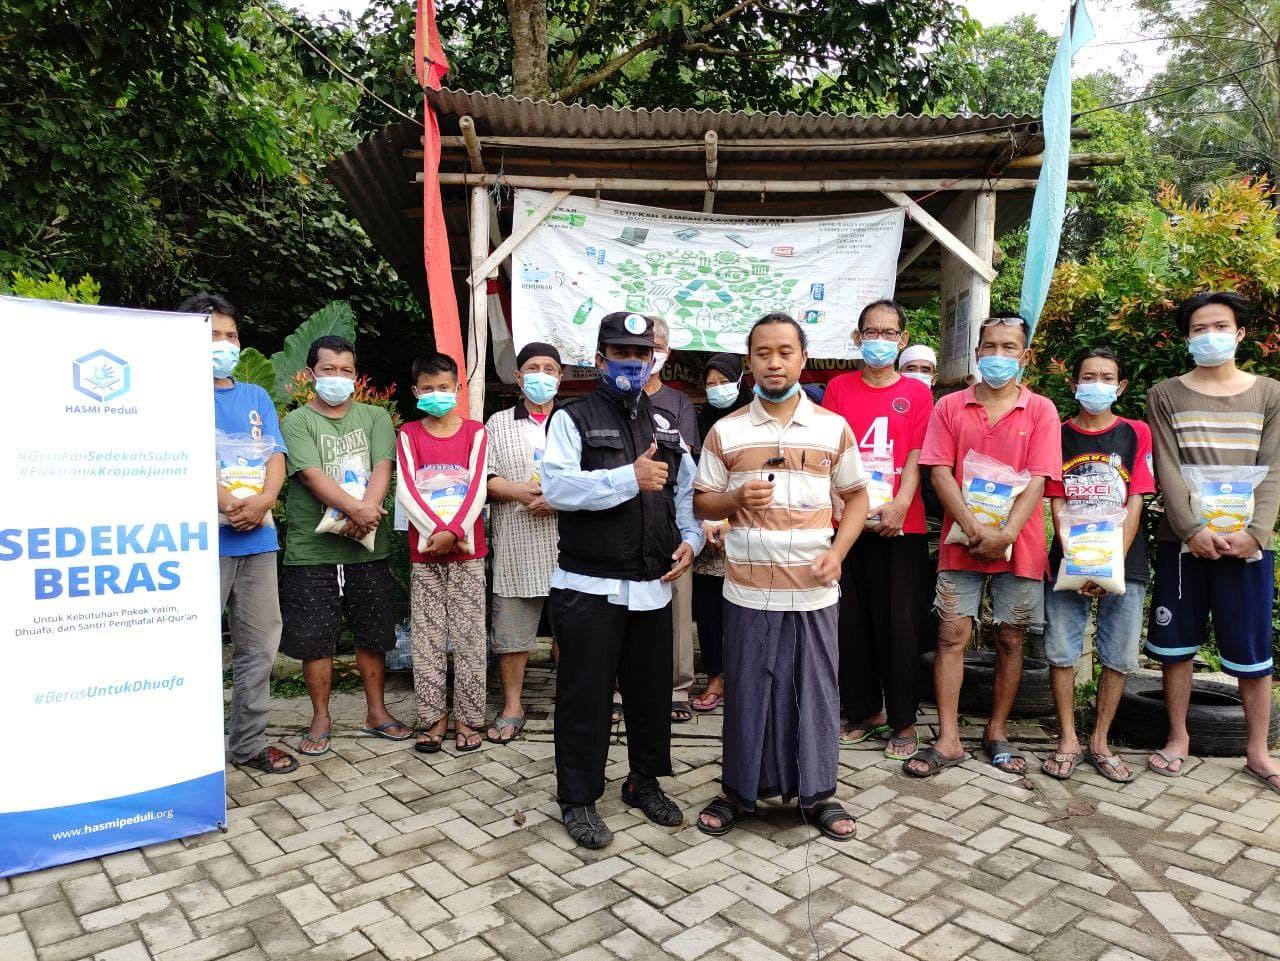 Paket Beras untuk Para  Dhuafa di Kp Kedondong Tangerang